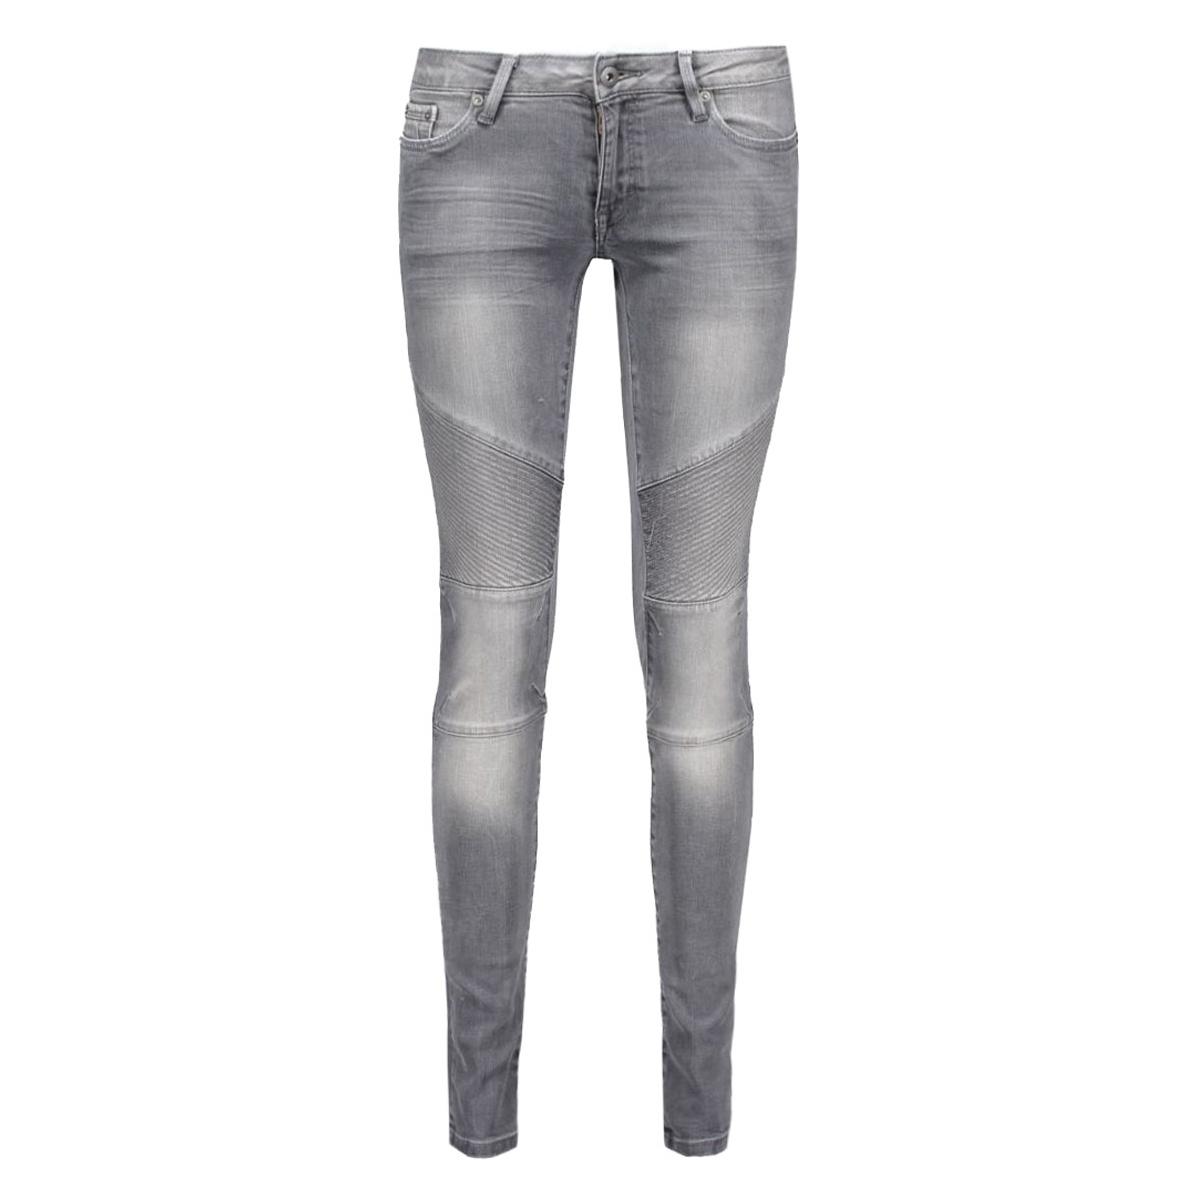 096cc1b018 edc jeans c922